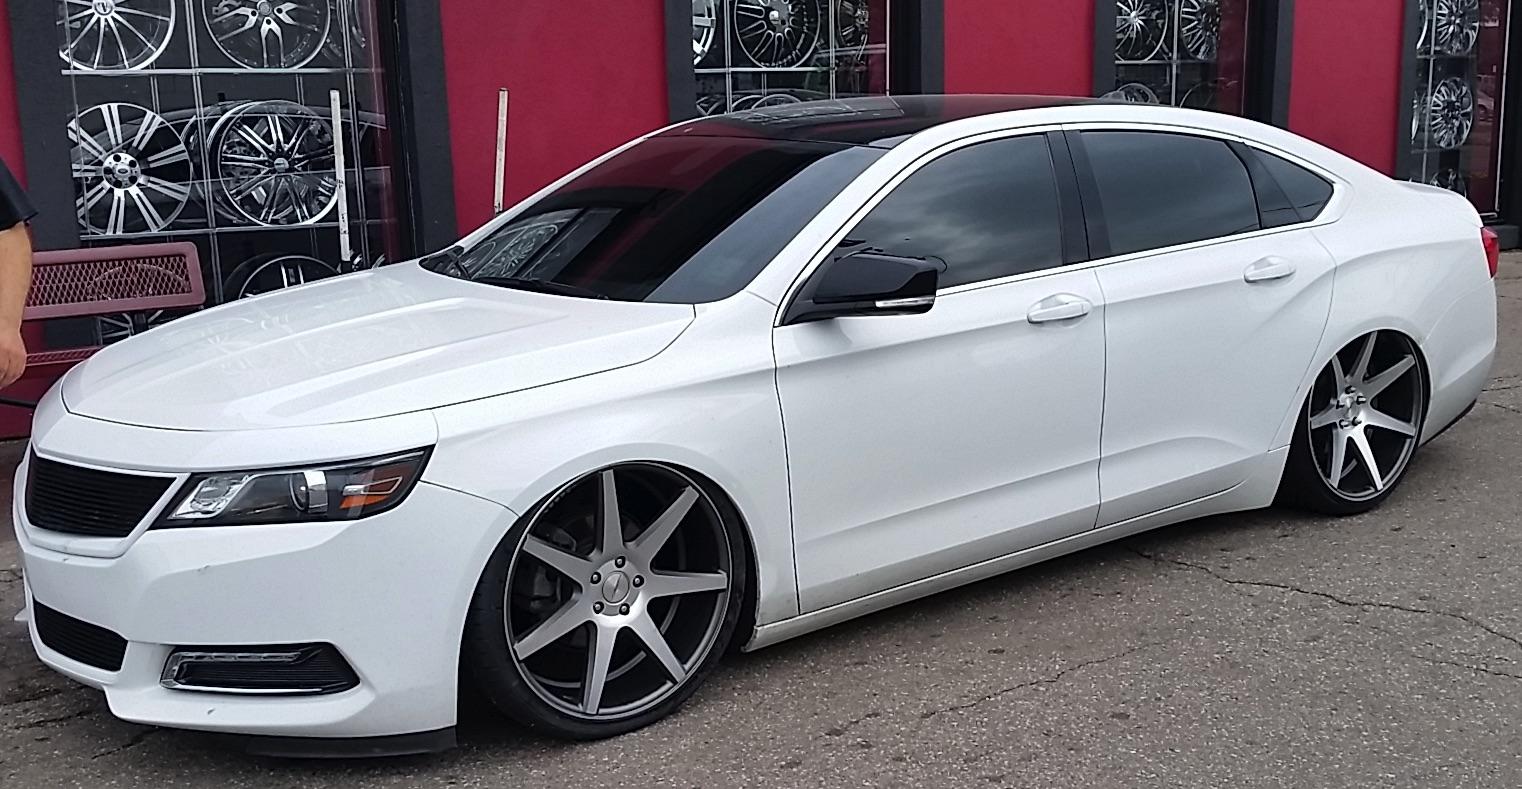 Impala 2009 chevy impala body kit : Eibach 2015 Impala Lowering Kit - Group Buy - Chevy Impala Forums